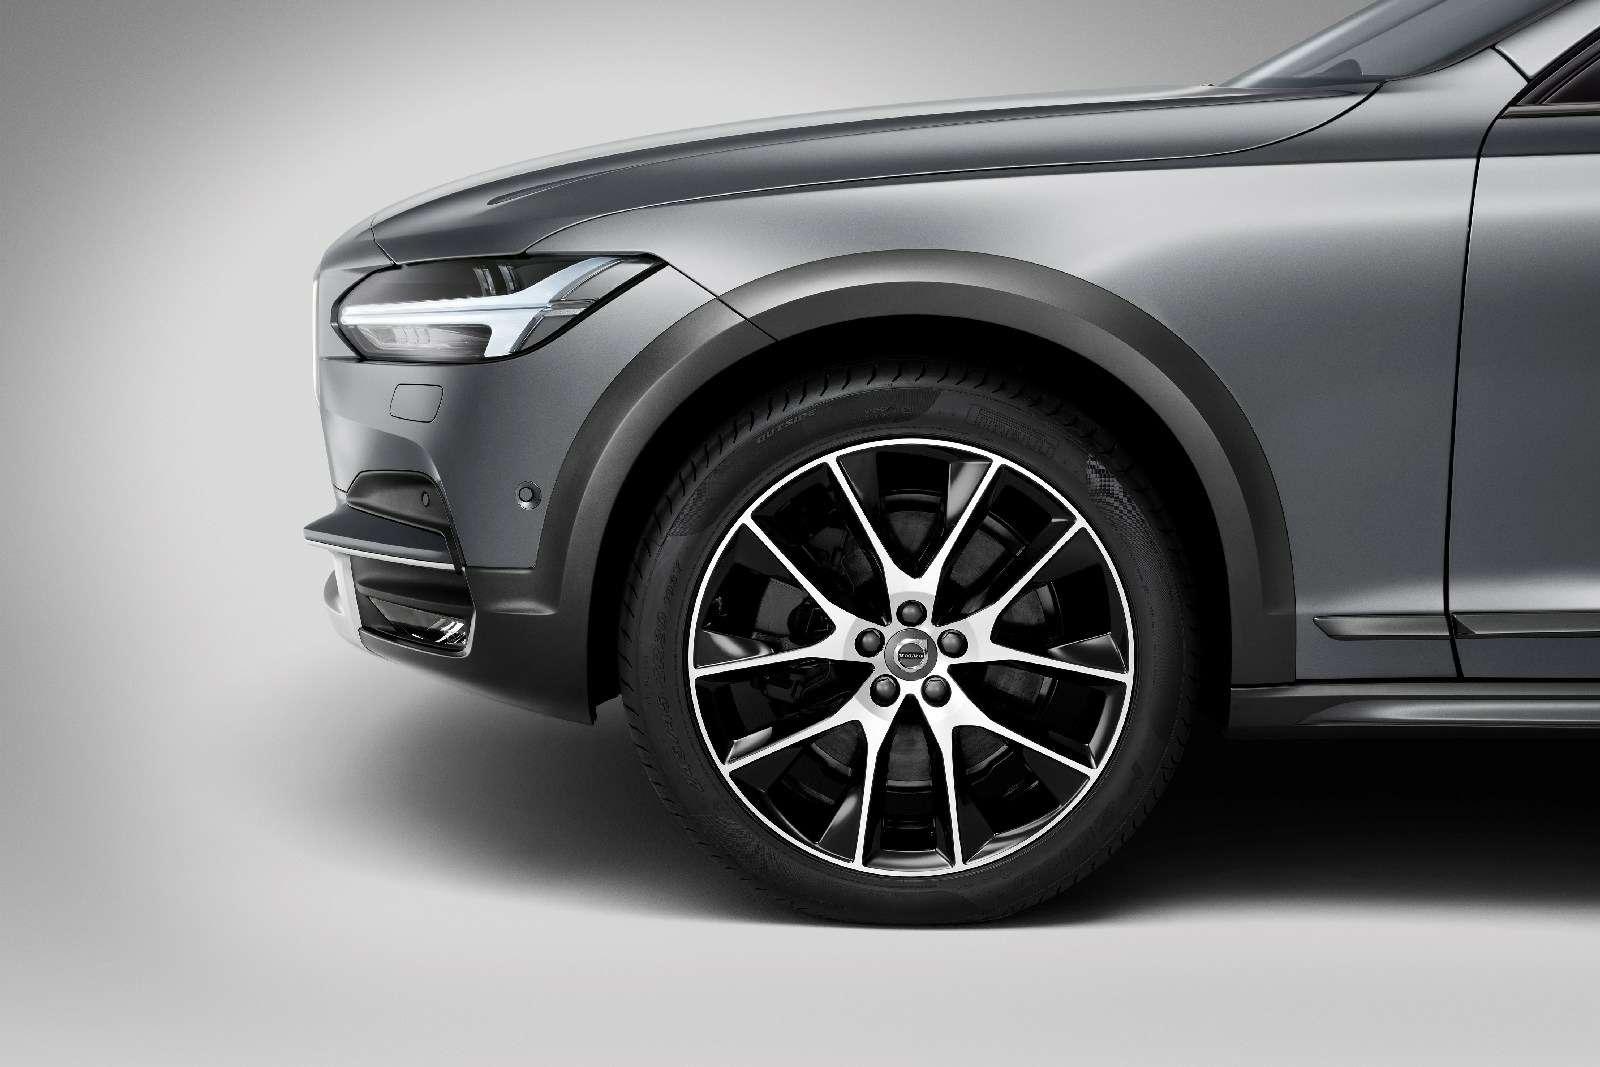 Такой «сарай» нам нужен: Volvo V90 Cross Country представлен официально— фото 635259